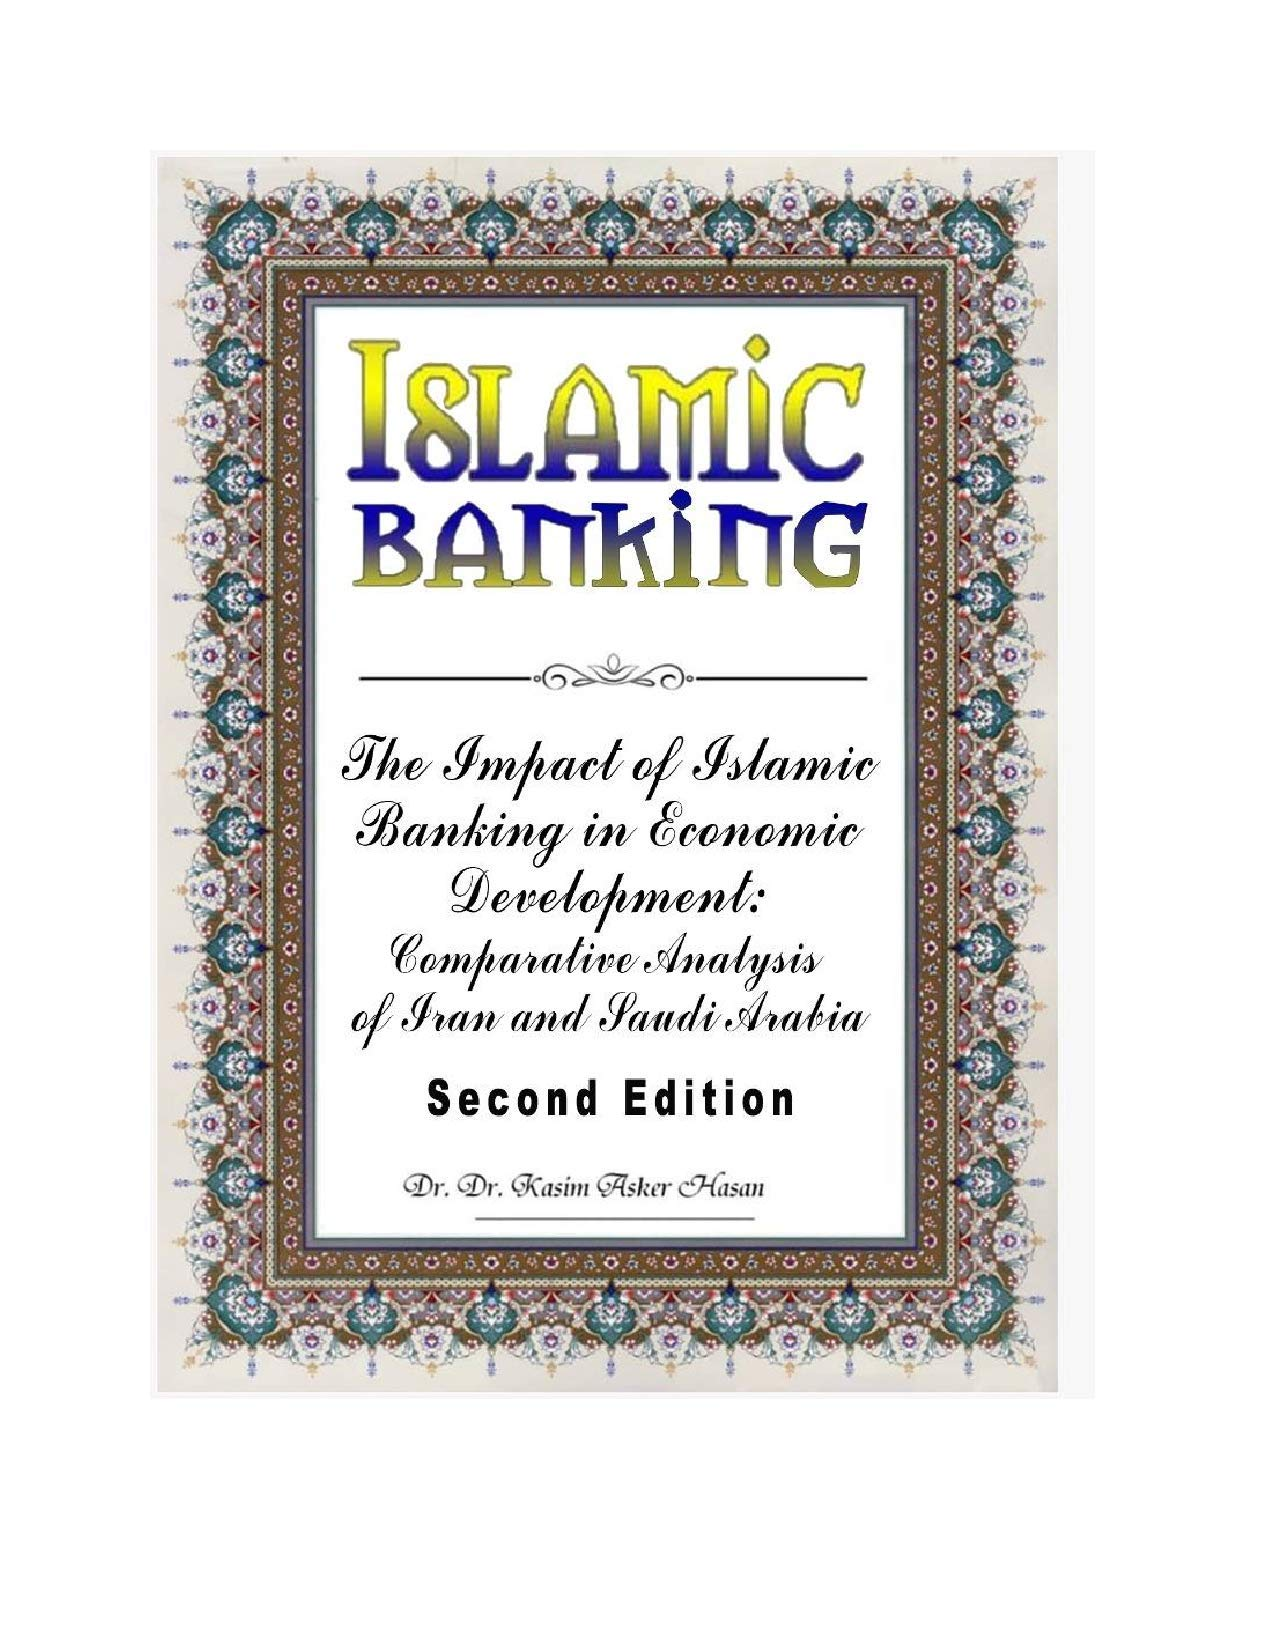 ISLAMIC BANKING Second Edition: IMPACT OF ISLAMIC BANKING ON ECONOMIC DEVELOPMENT - COMPARATIVE ANALYSIS OF IRAN AND SAUDI ARABIA